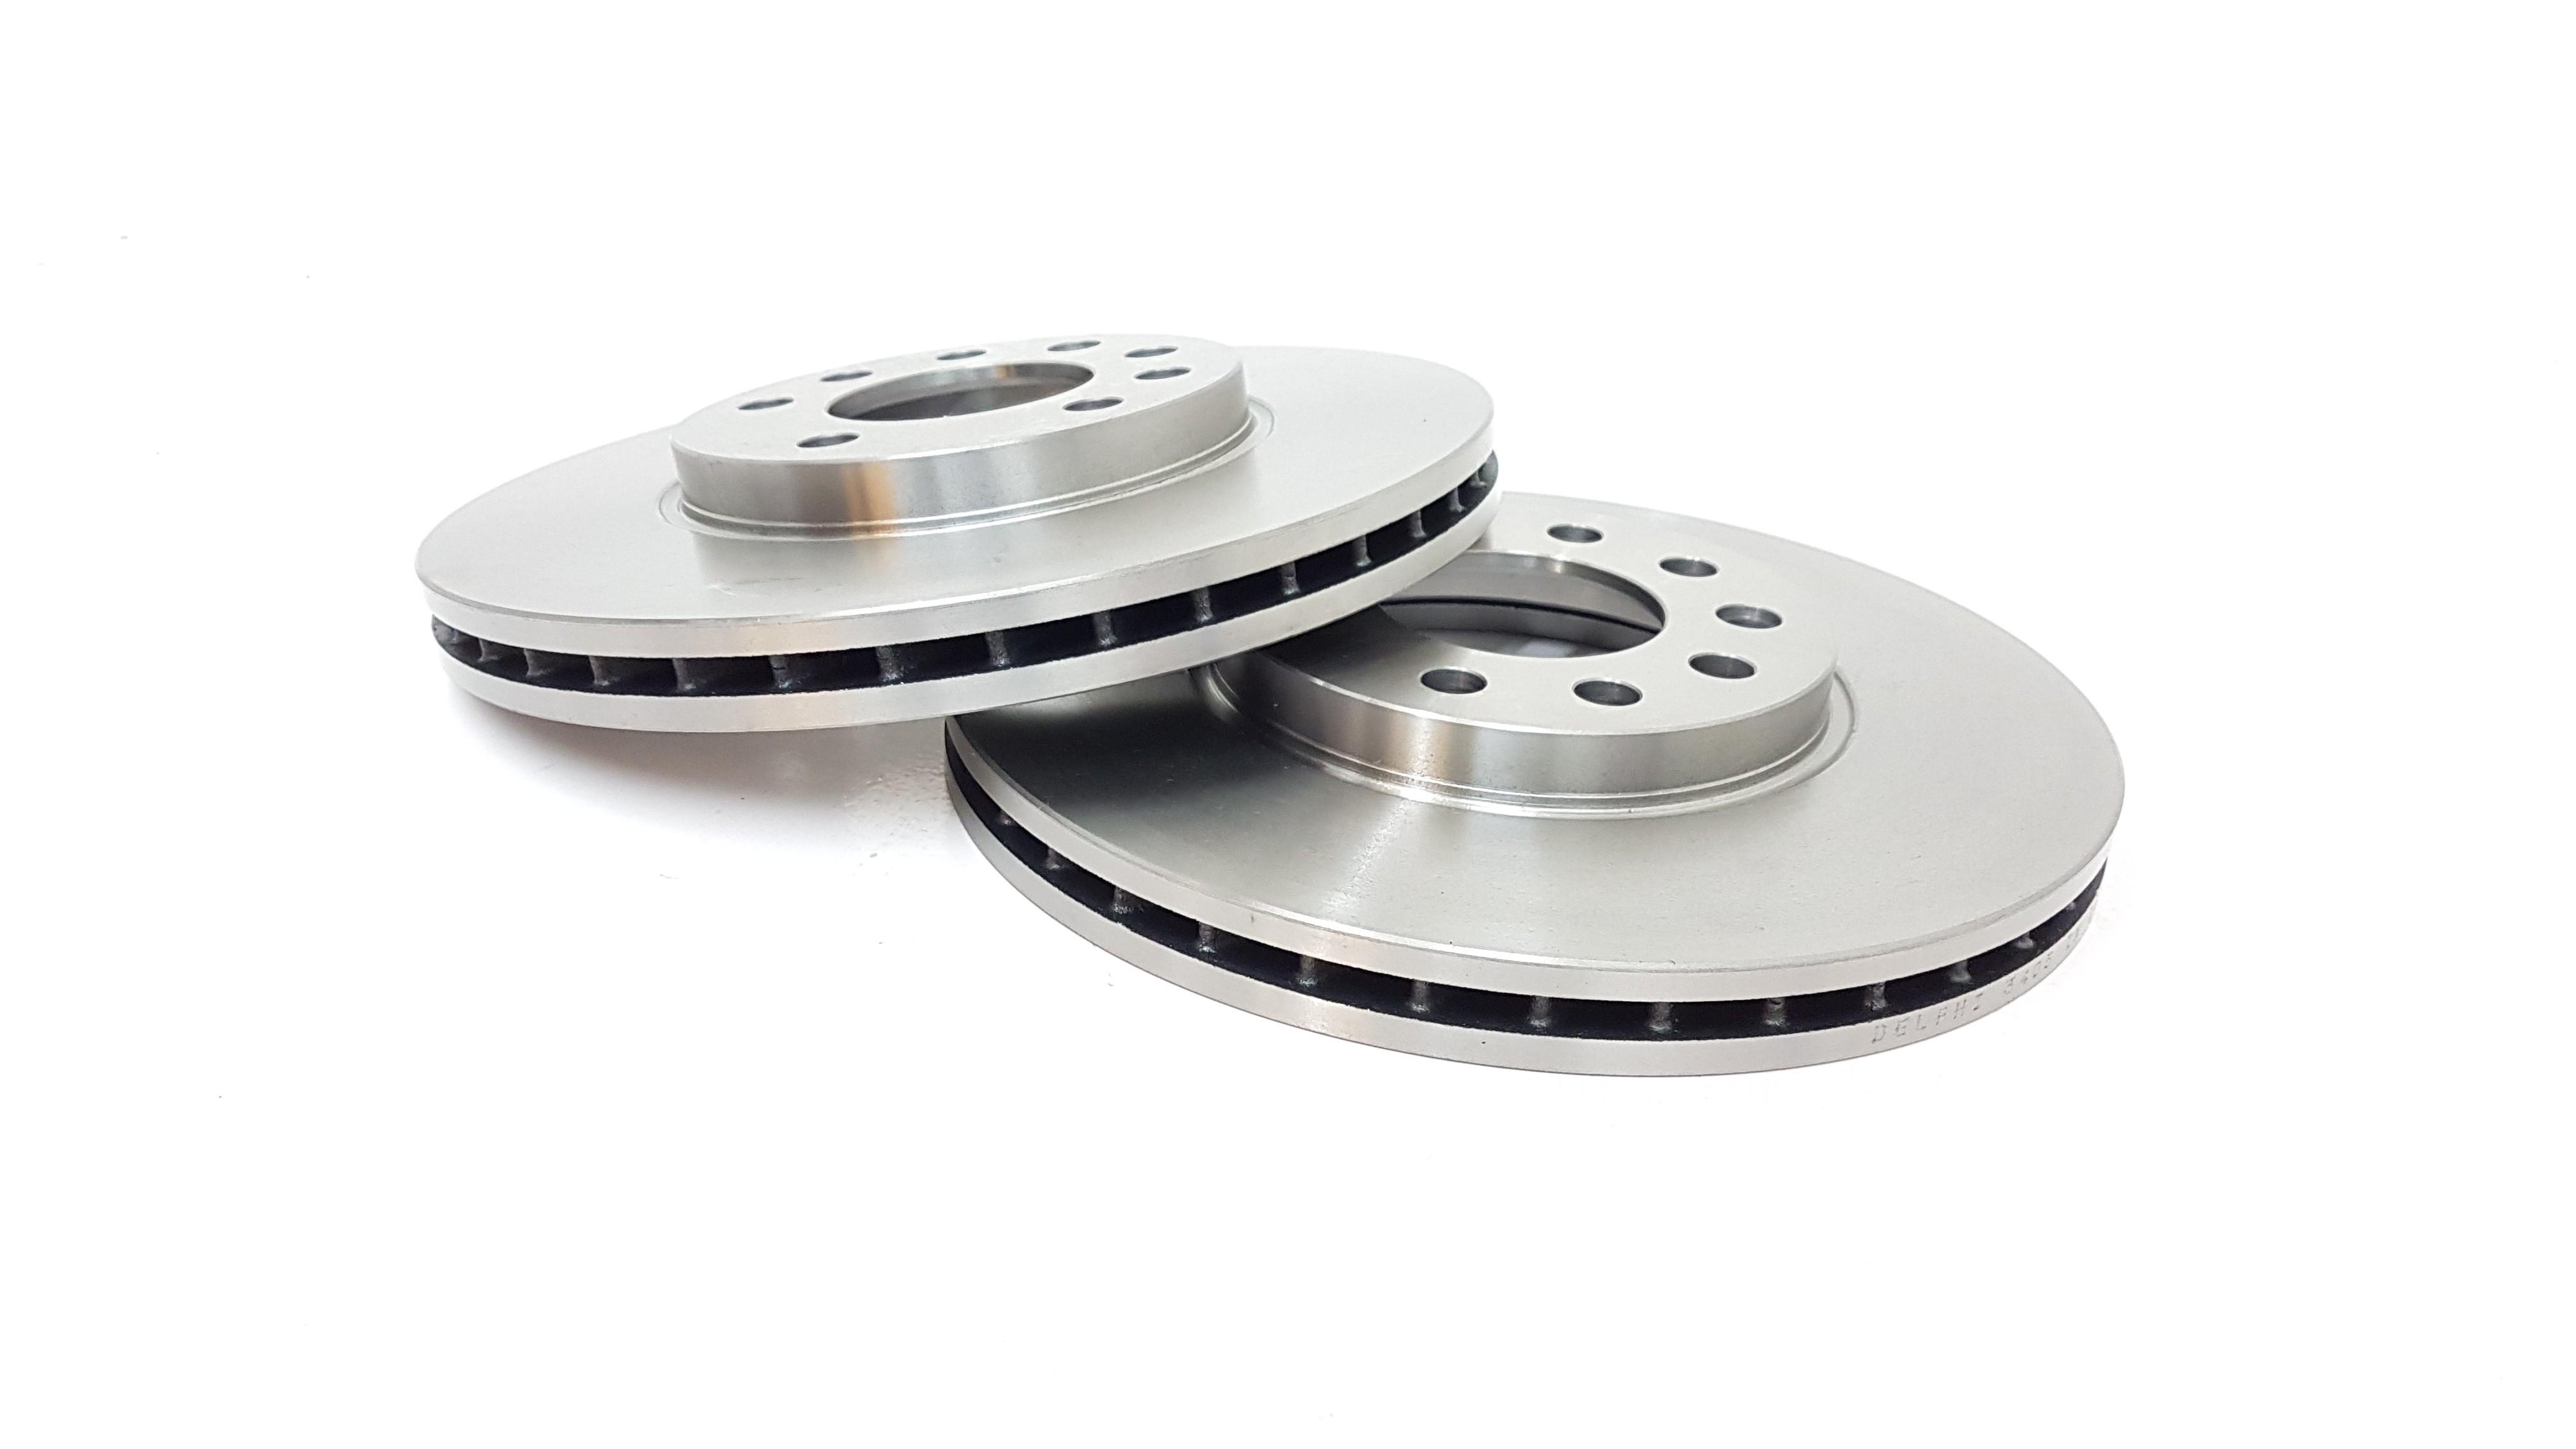 Brake Discs 280mm Vented Opel Zafira B 1.6 CNG Turbo 1.8 2.2 Front Brake Pads